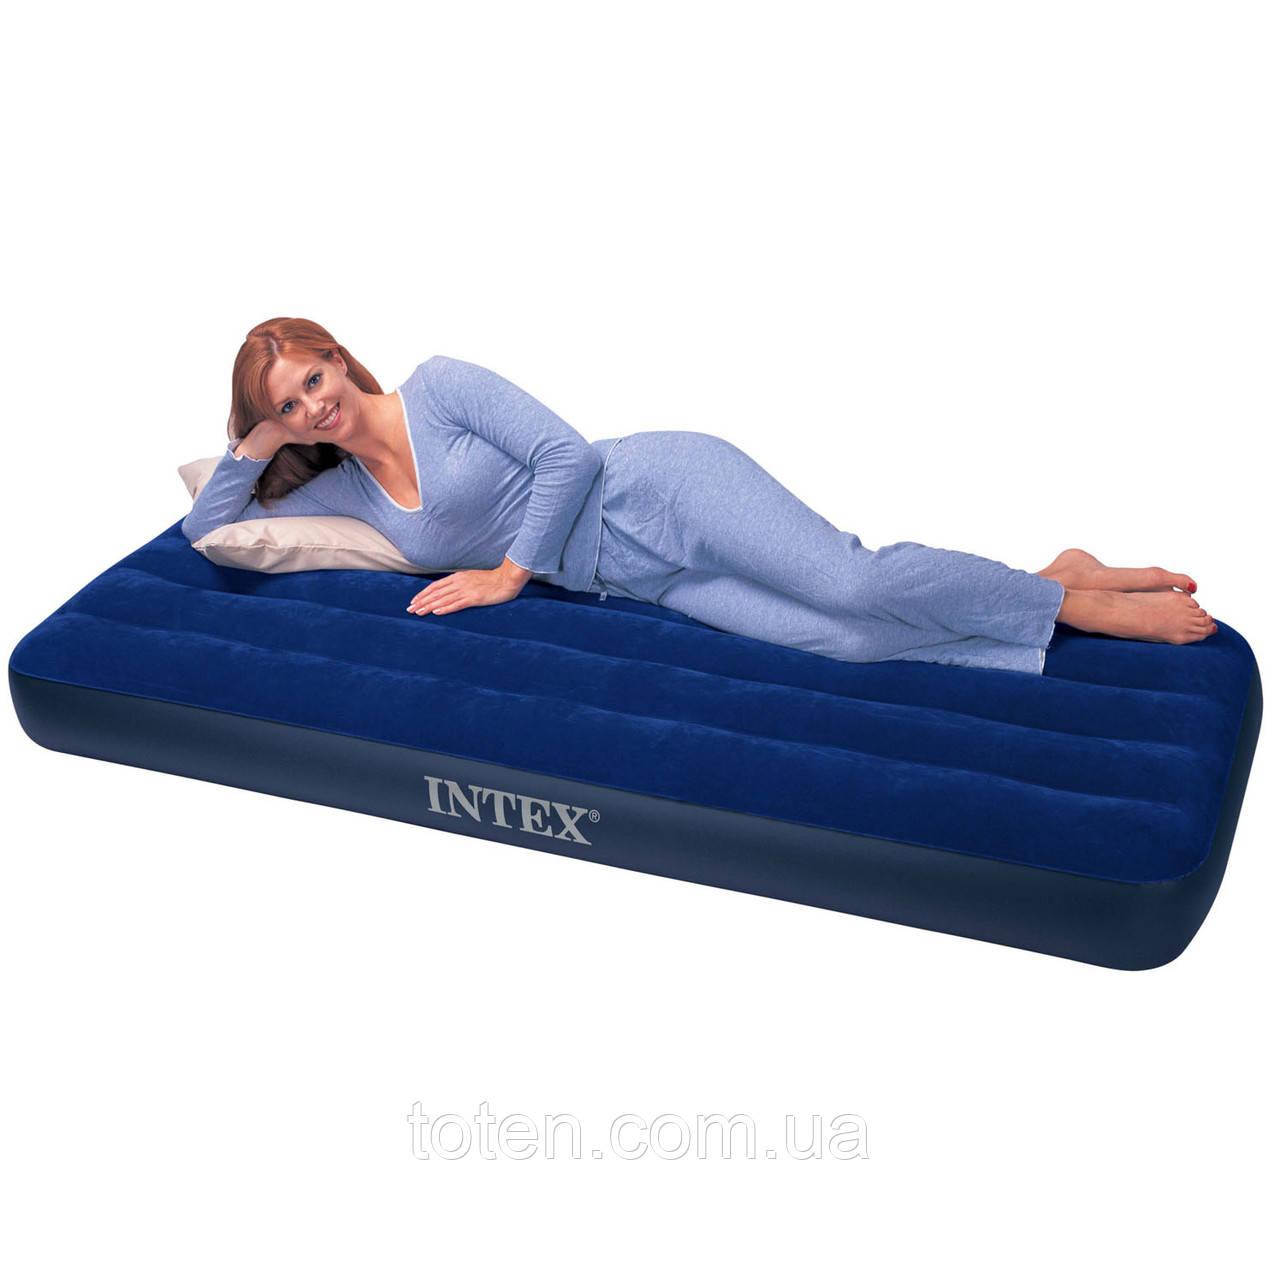 Велюровый надувной матрас Intex 68950 (76х191х22см)  (64756)